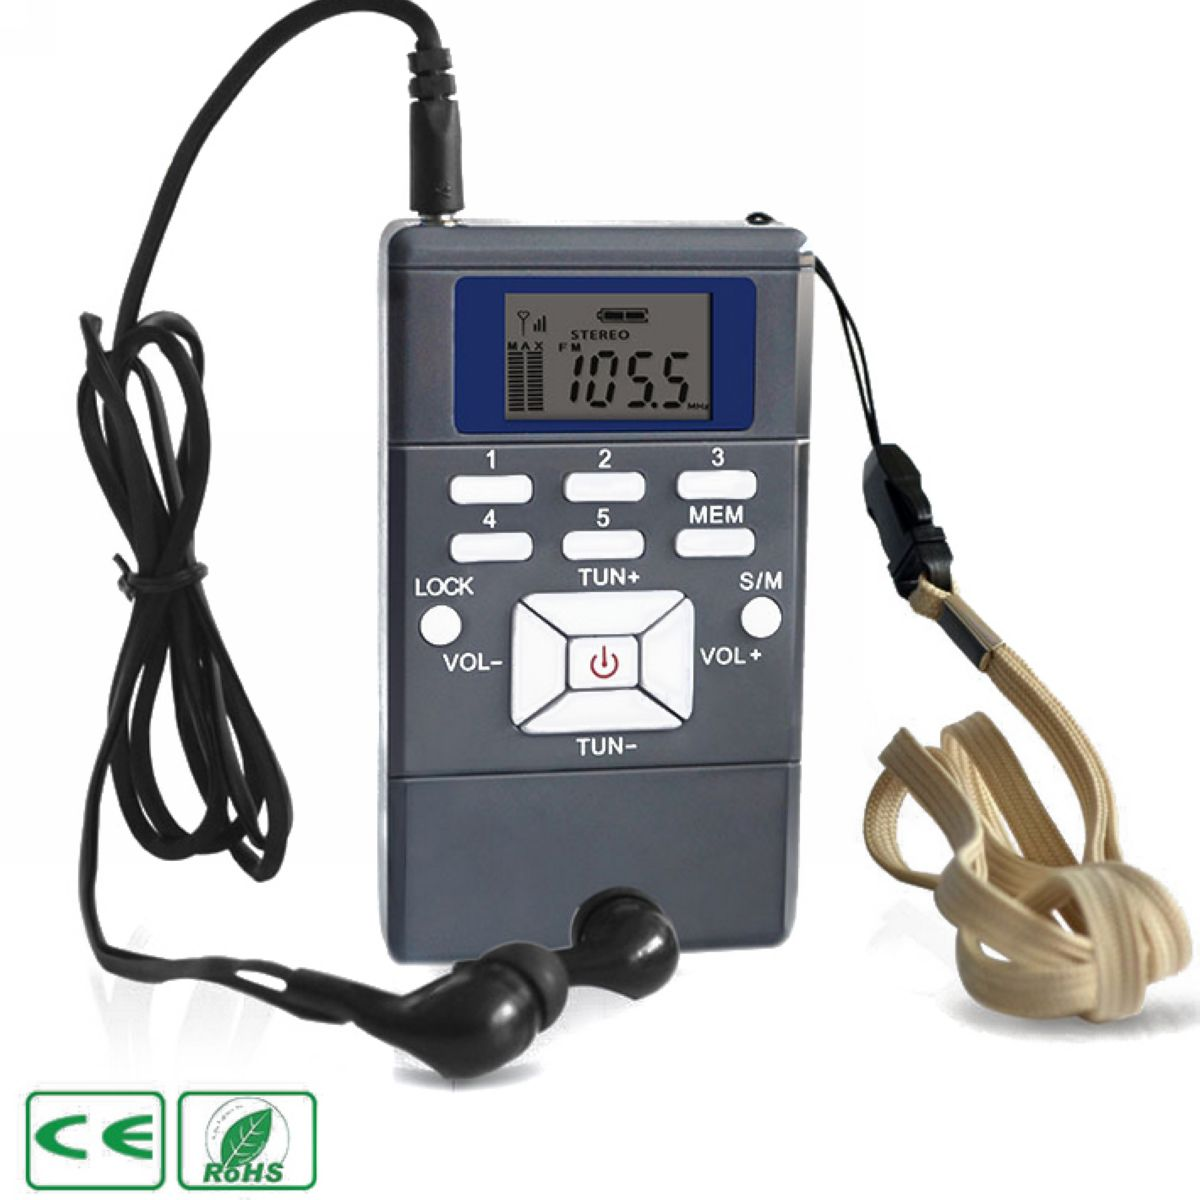 60-108MHz Portable Handheld Digital FM Radio Gray Plastic Shell FM Radio Receiver Battery Powered with Earphone